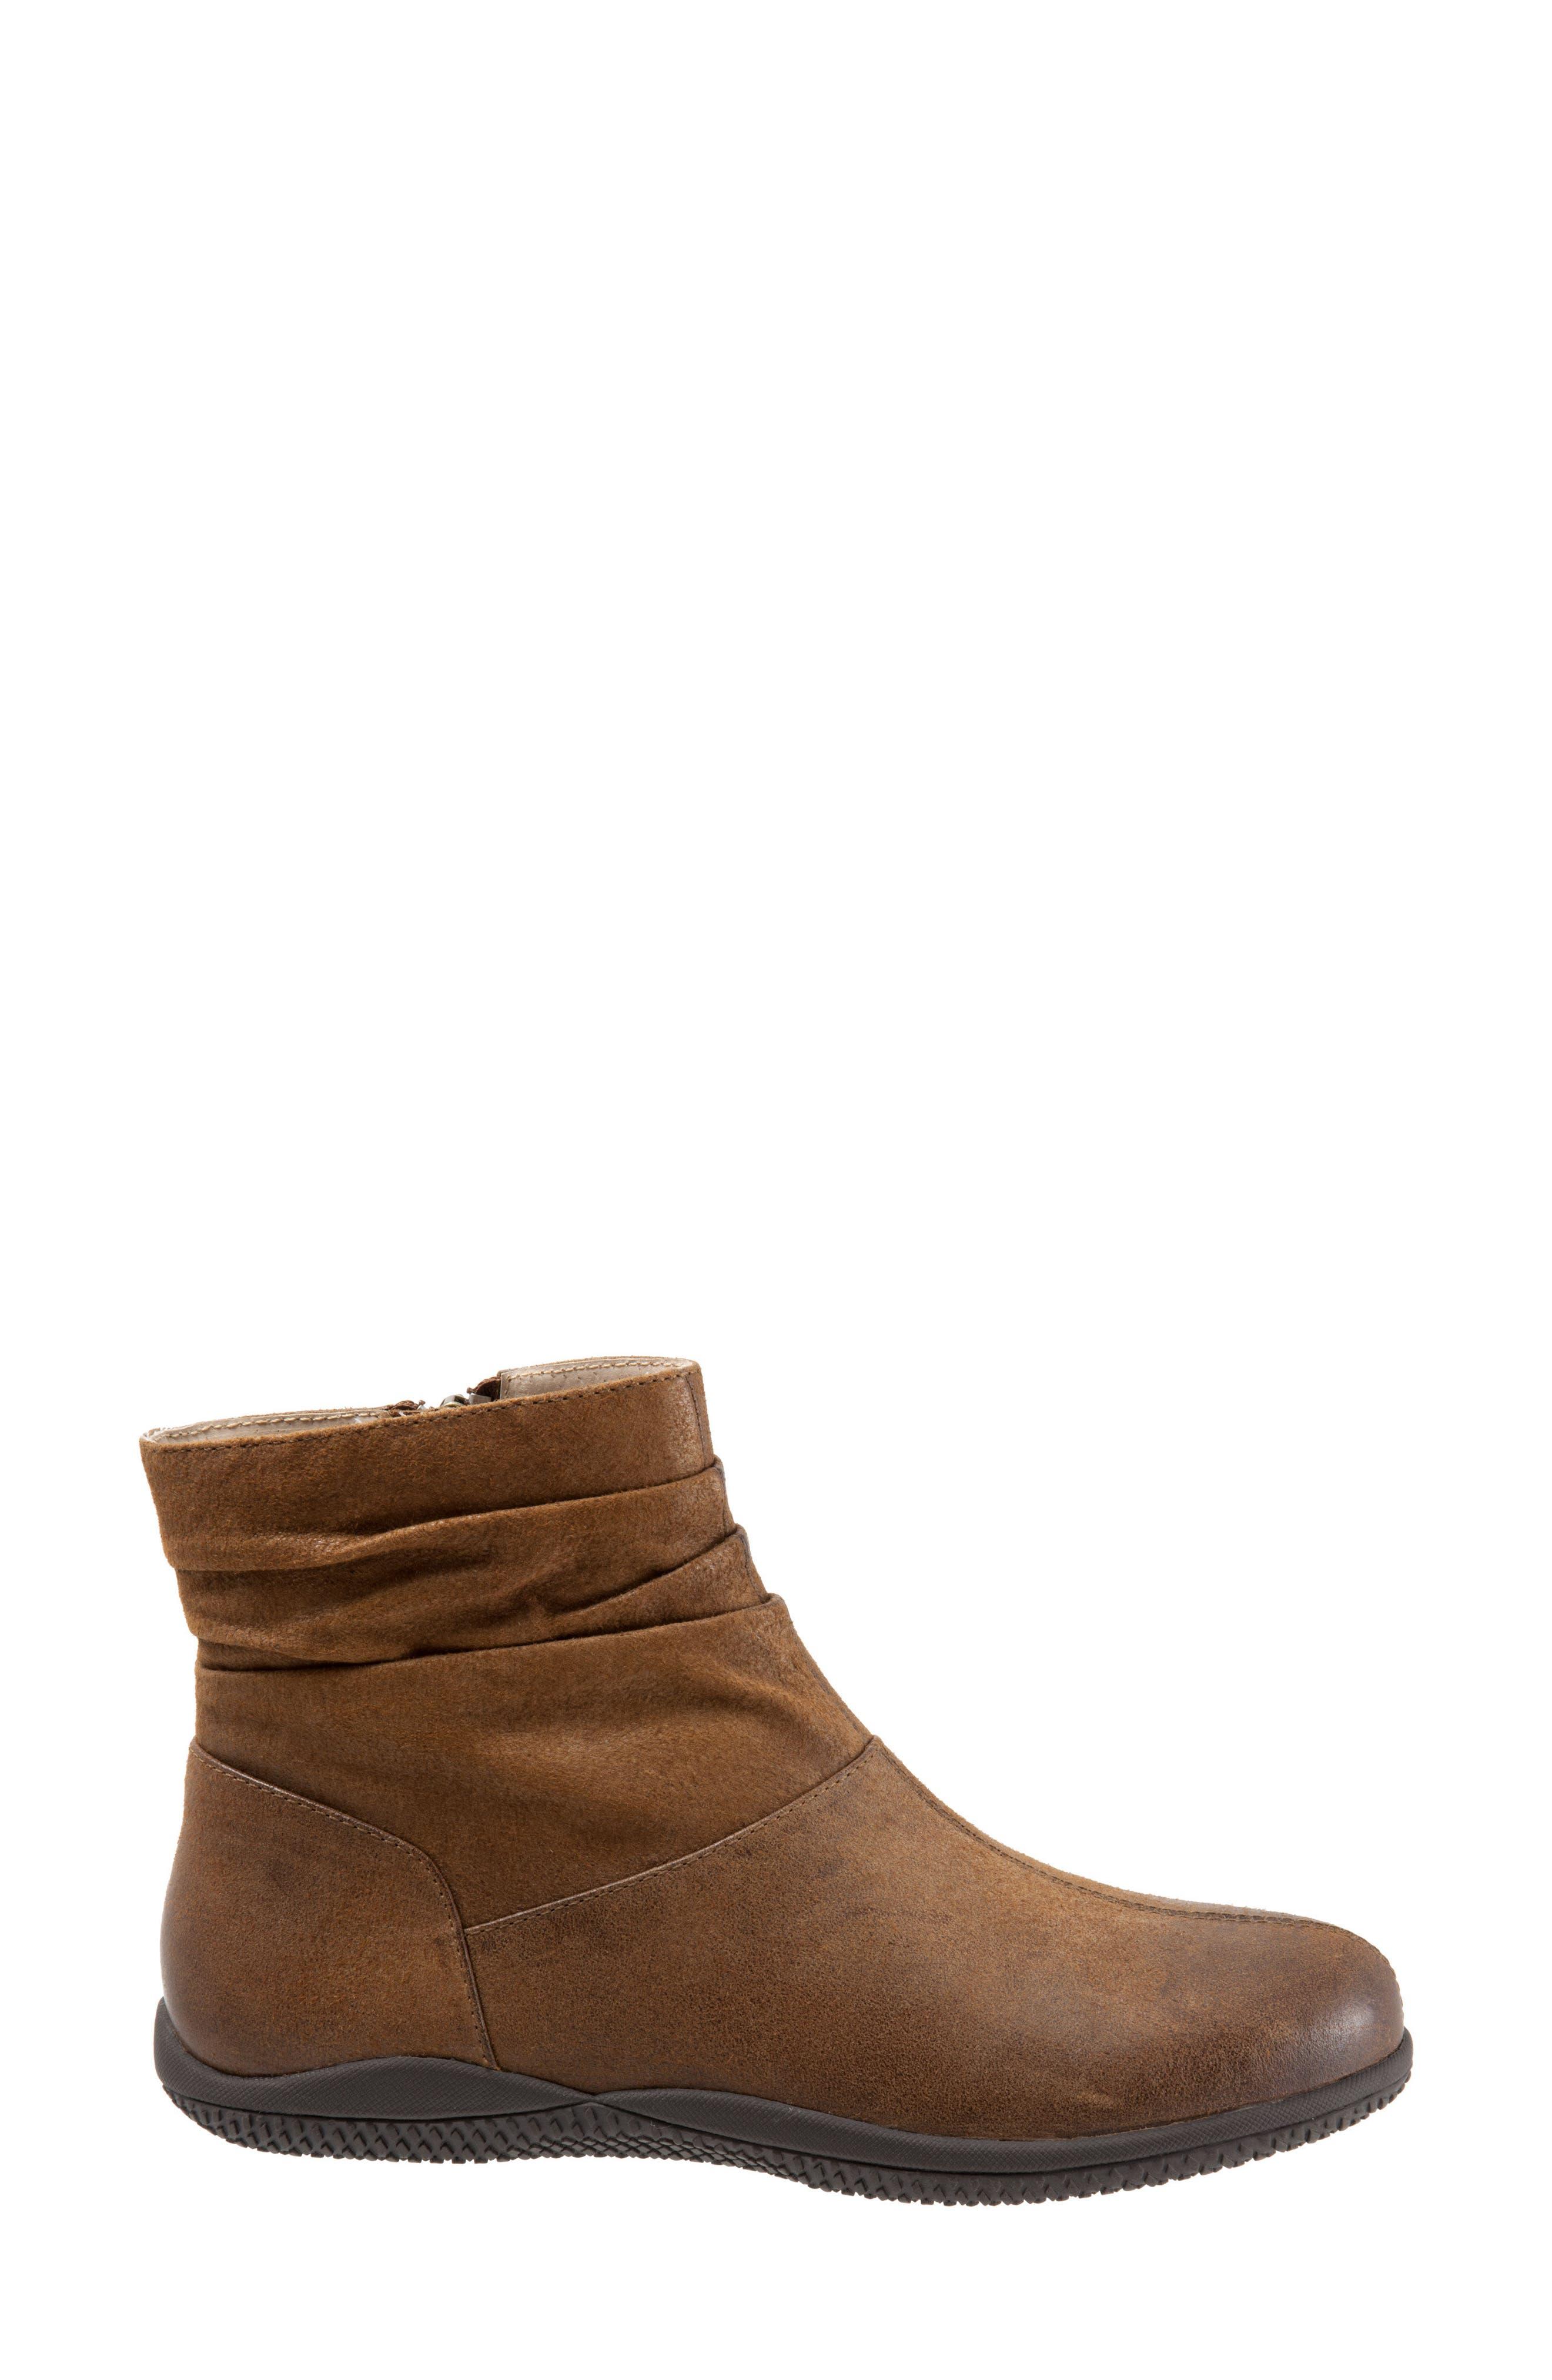 Alternate Image 3  - SoftWalk® 'Hanover' Leather Boot (Women)